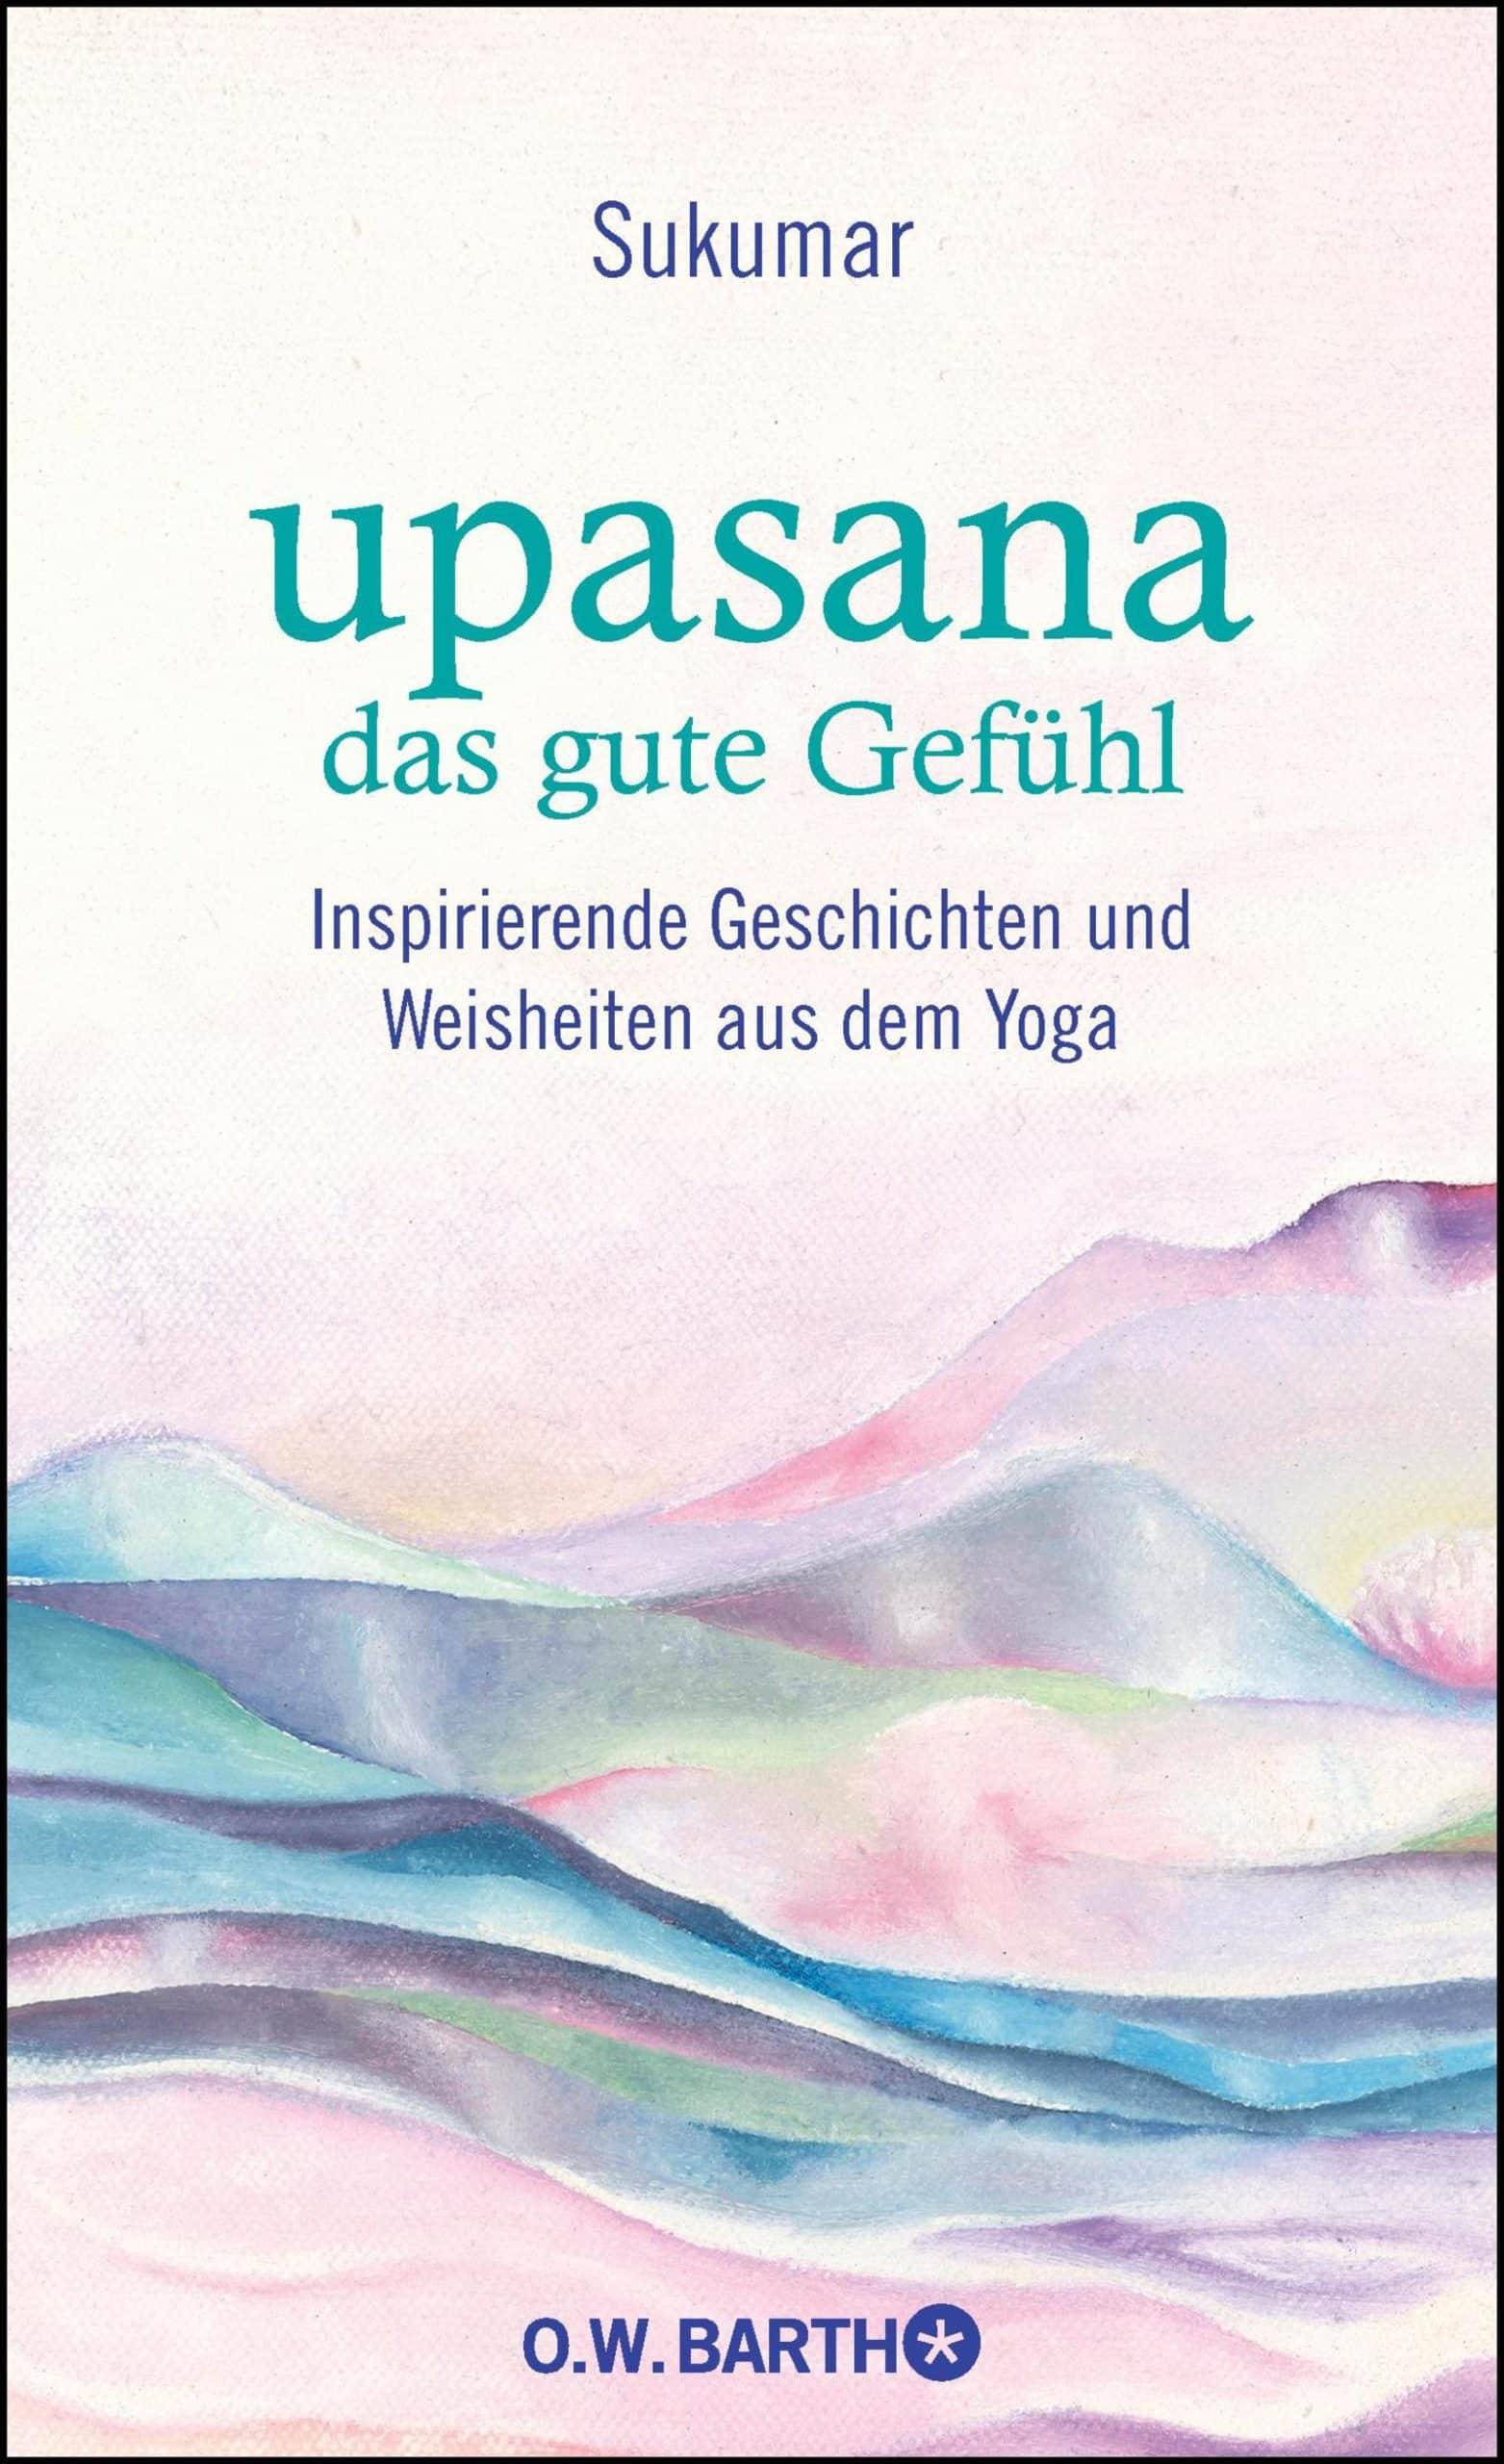 Yoga Xperience Rezensionen 2020 Upasana- Das gute Gefuehl von Sukumar & Eberhard Baerr © OW Barth